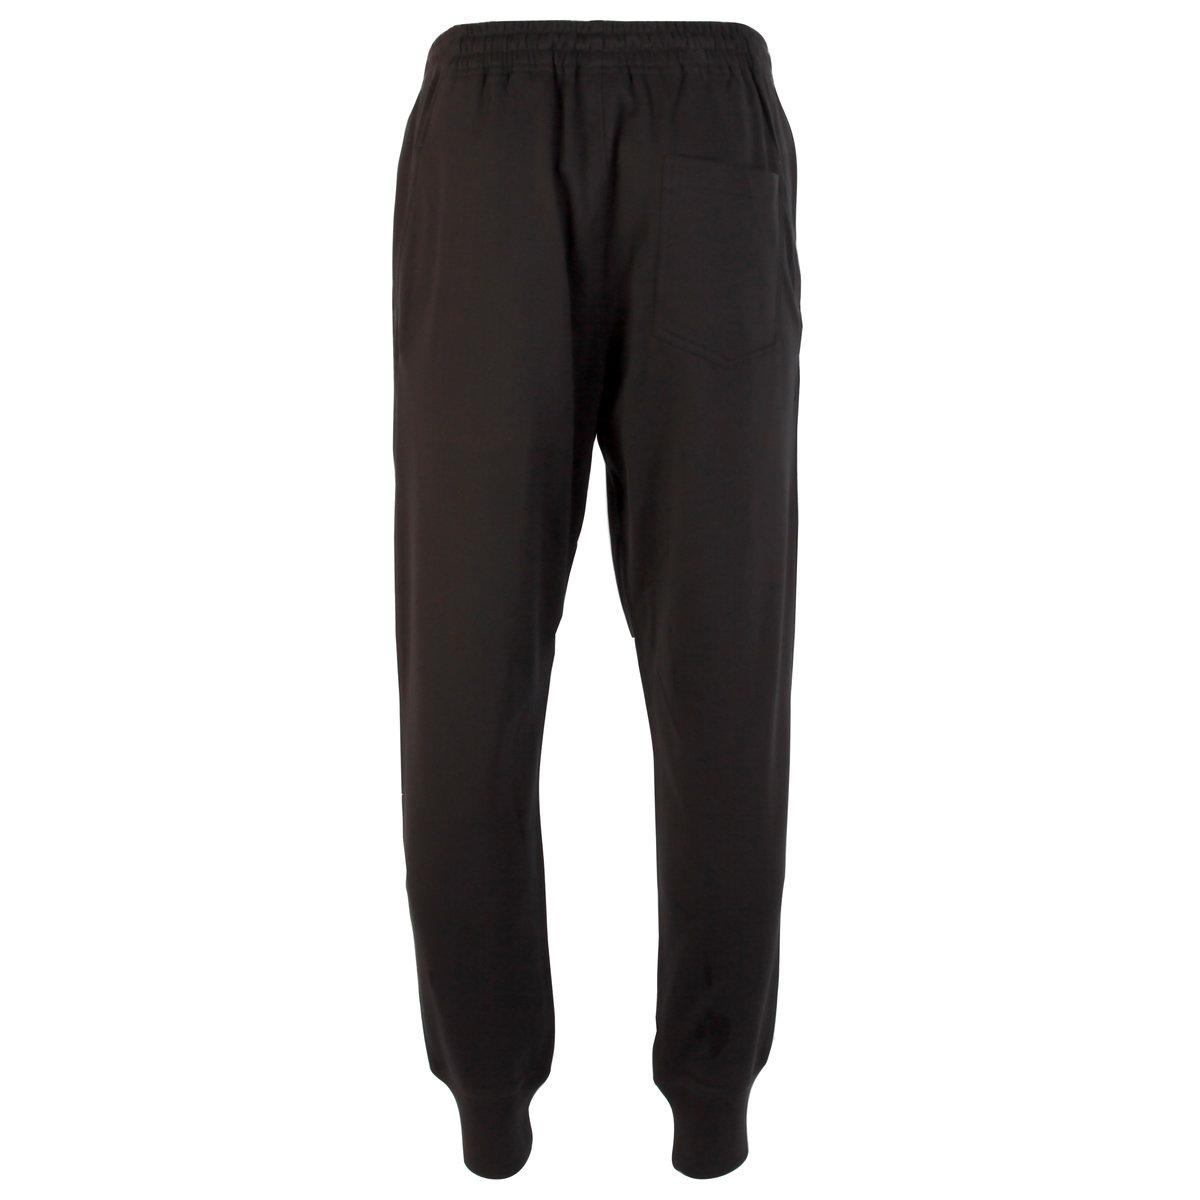 Mens Y-3 Classic Cuff Pants In Black